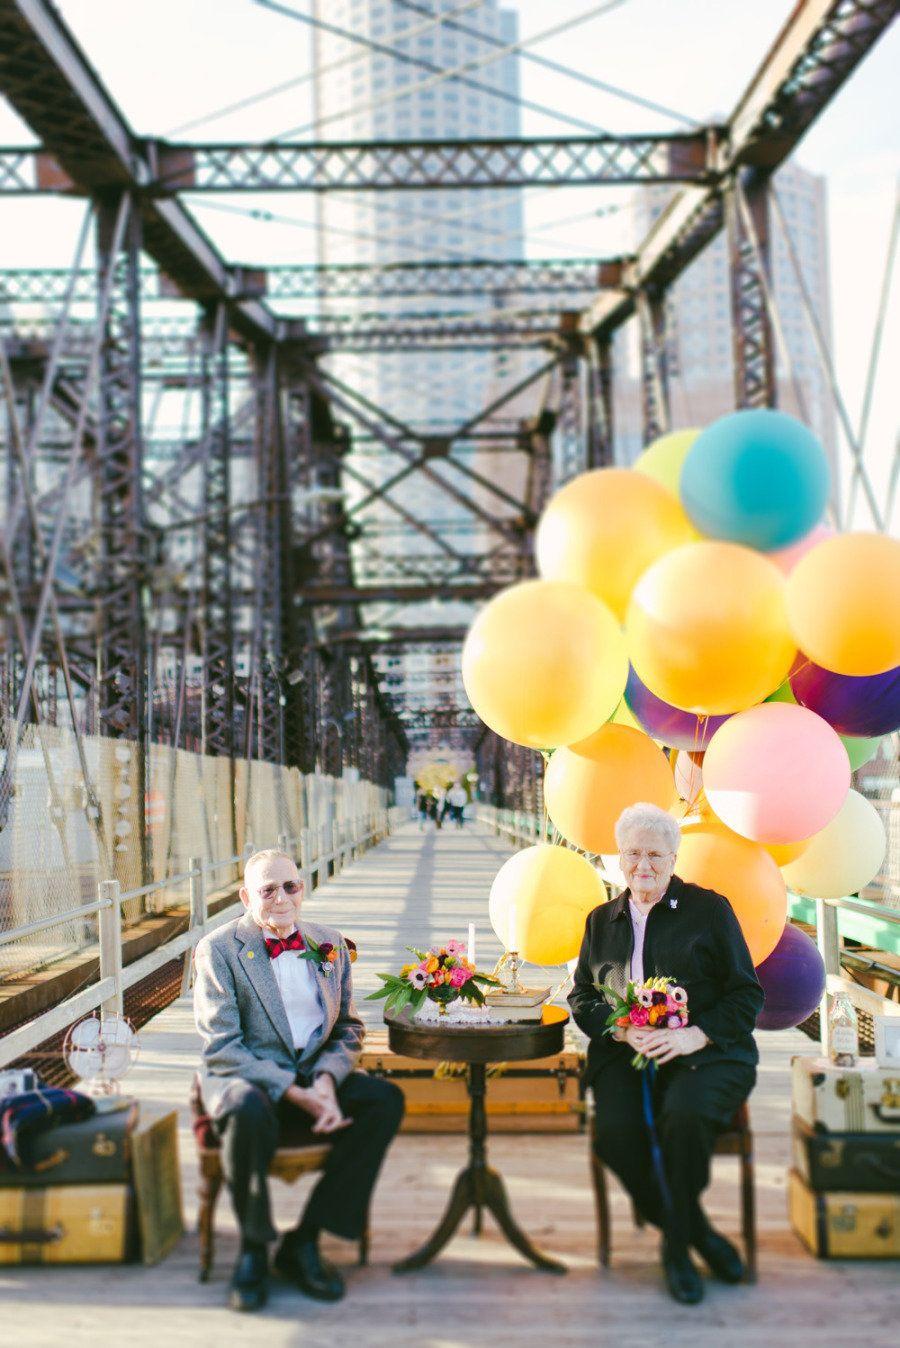 "(<a href=""http://www.cambriagrace.com/"">Cambria Grace Photography</a> / <a href=""http://wildfolkstudio.com/"">Wild Folk Studio"